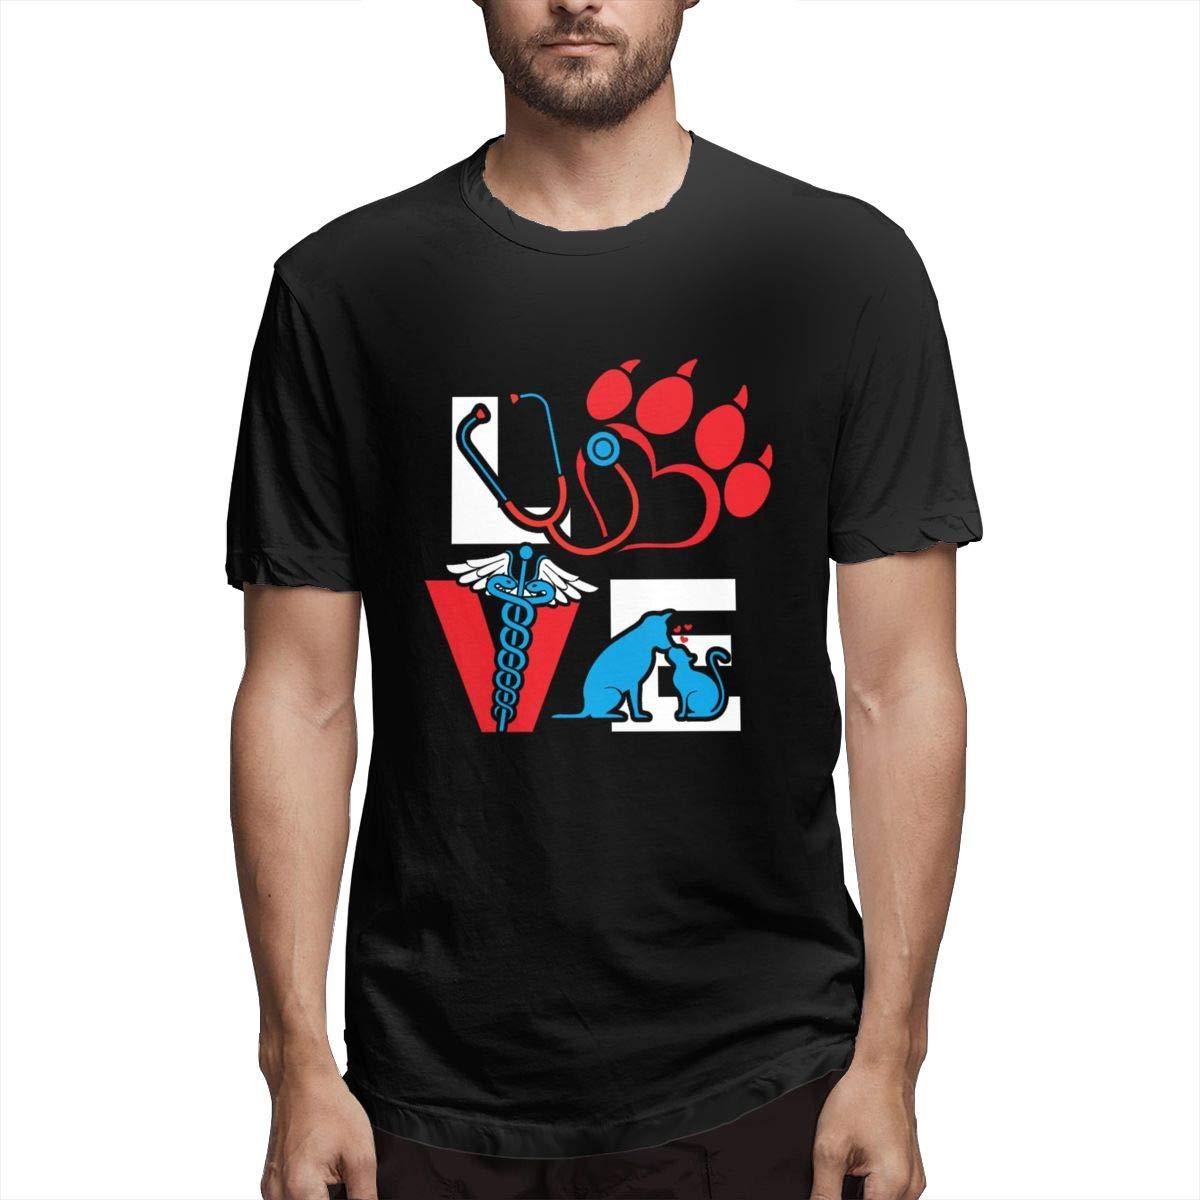 Veterinarian Love Cat And Dog Veterinary S Short Sleeve Tshirts